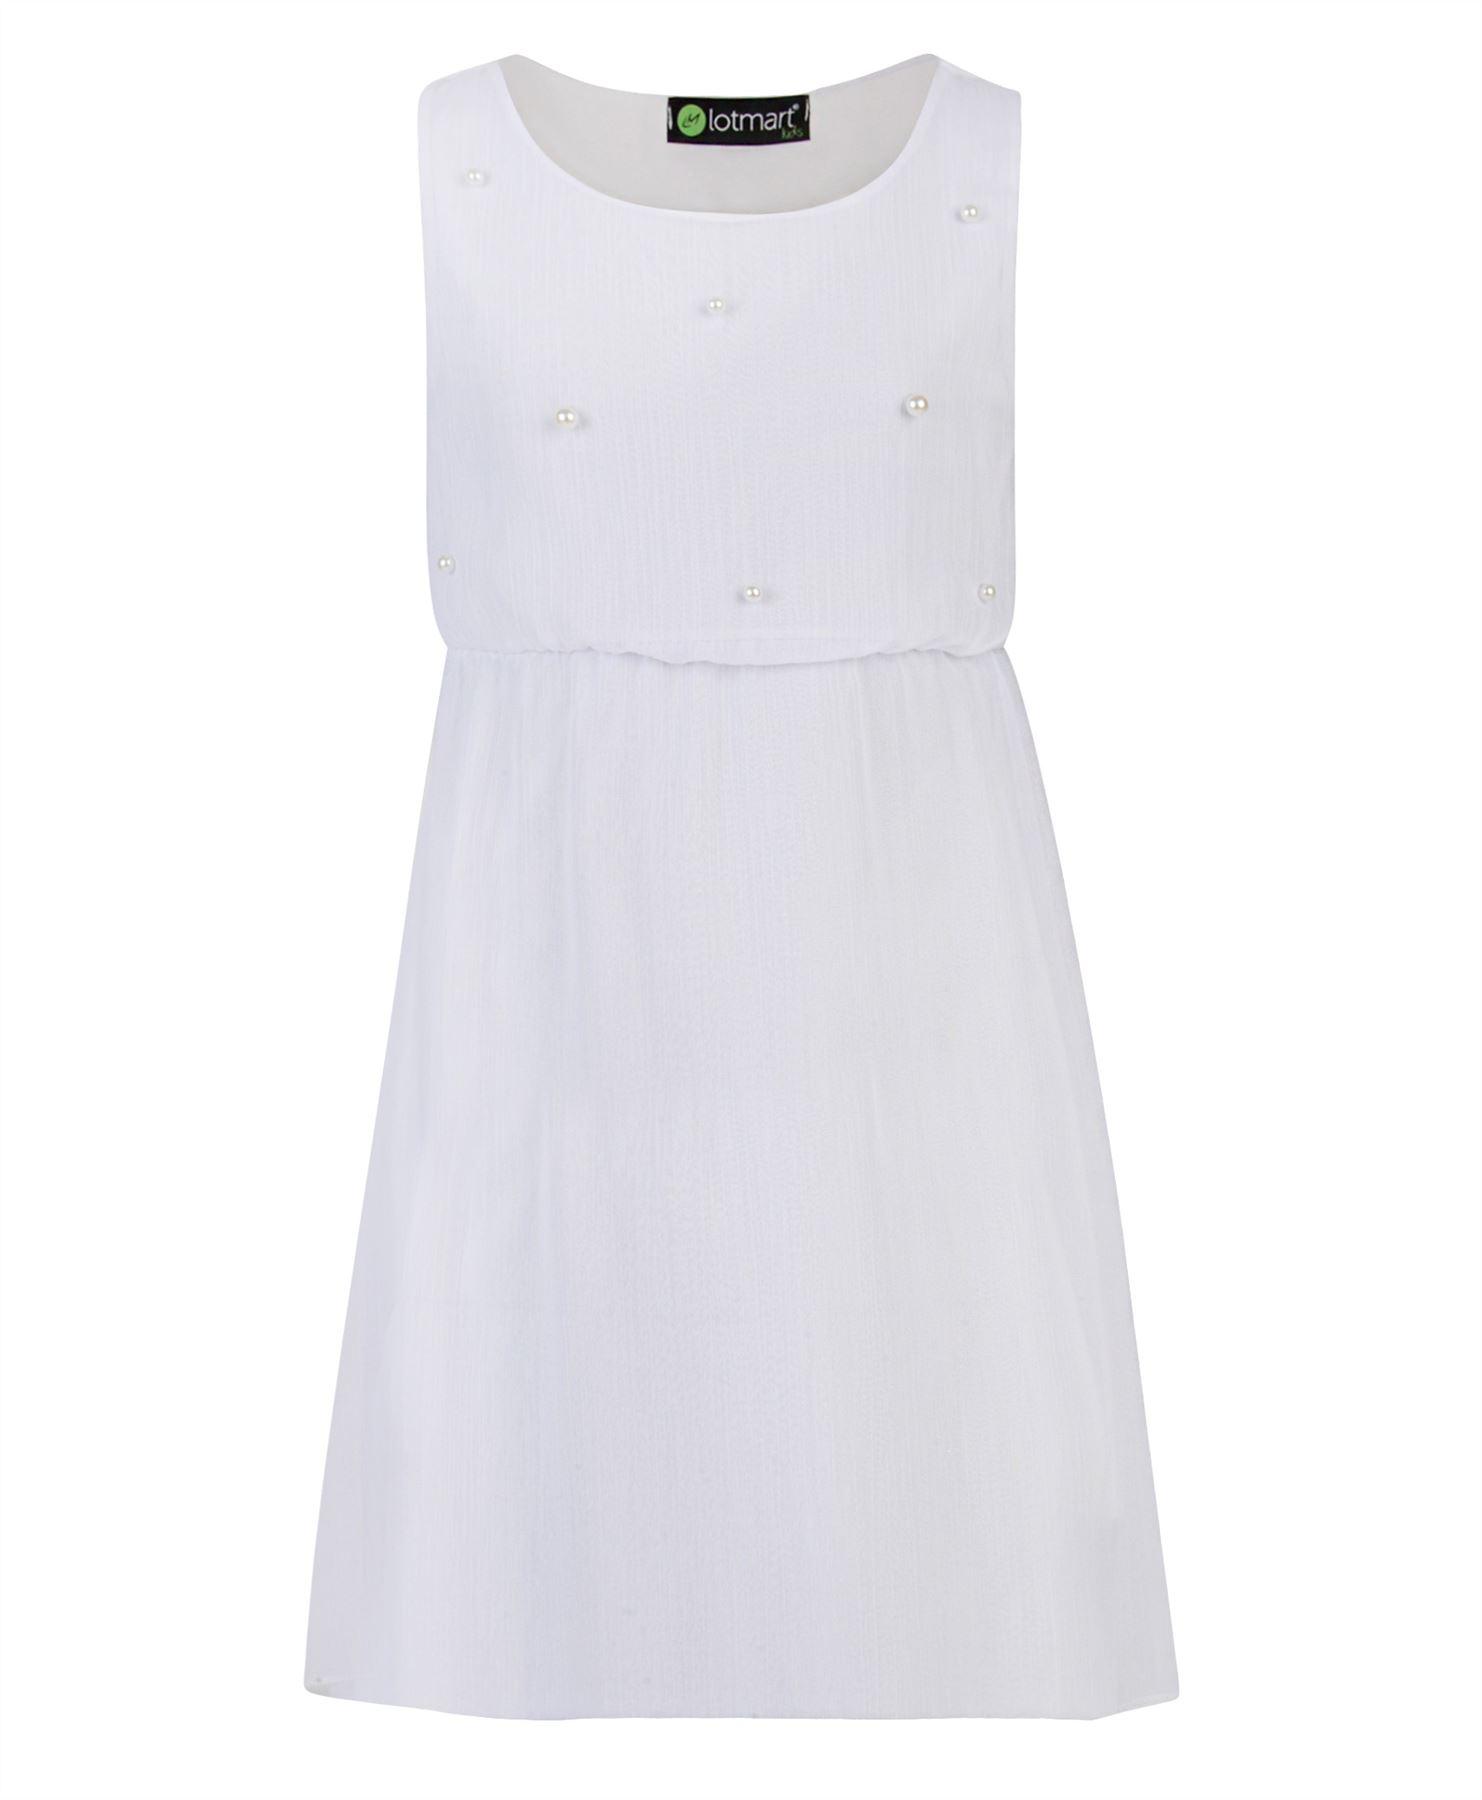 nina-Chiffon-Detalle-De-Perla-sin-mangas-verano-vestido-Casual-Top-Fiesta-3-14